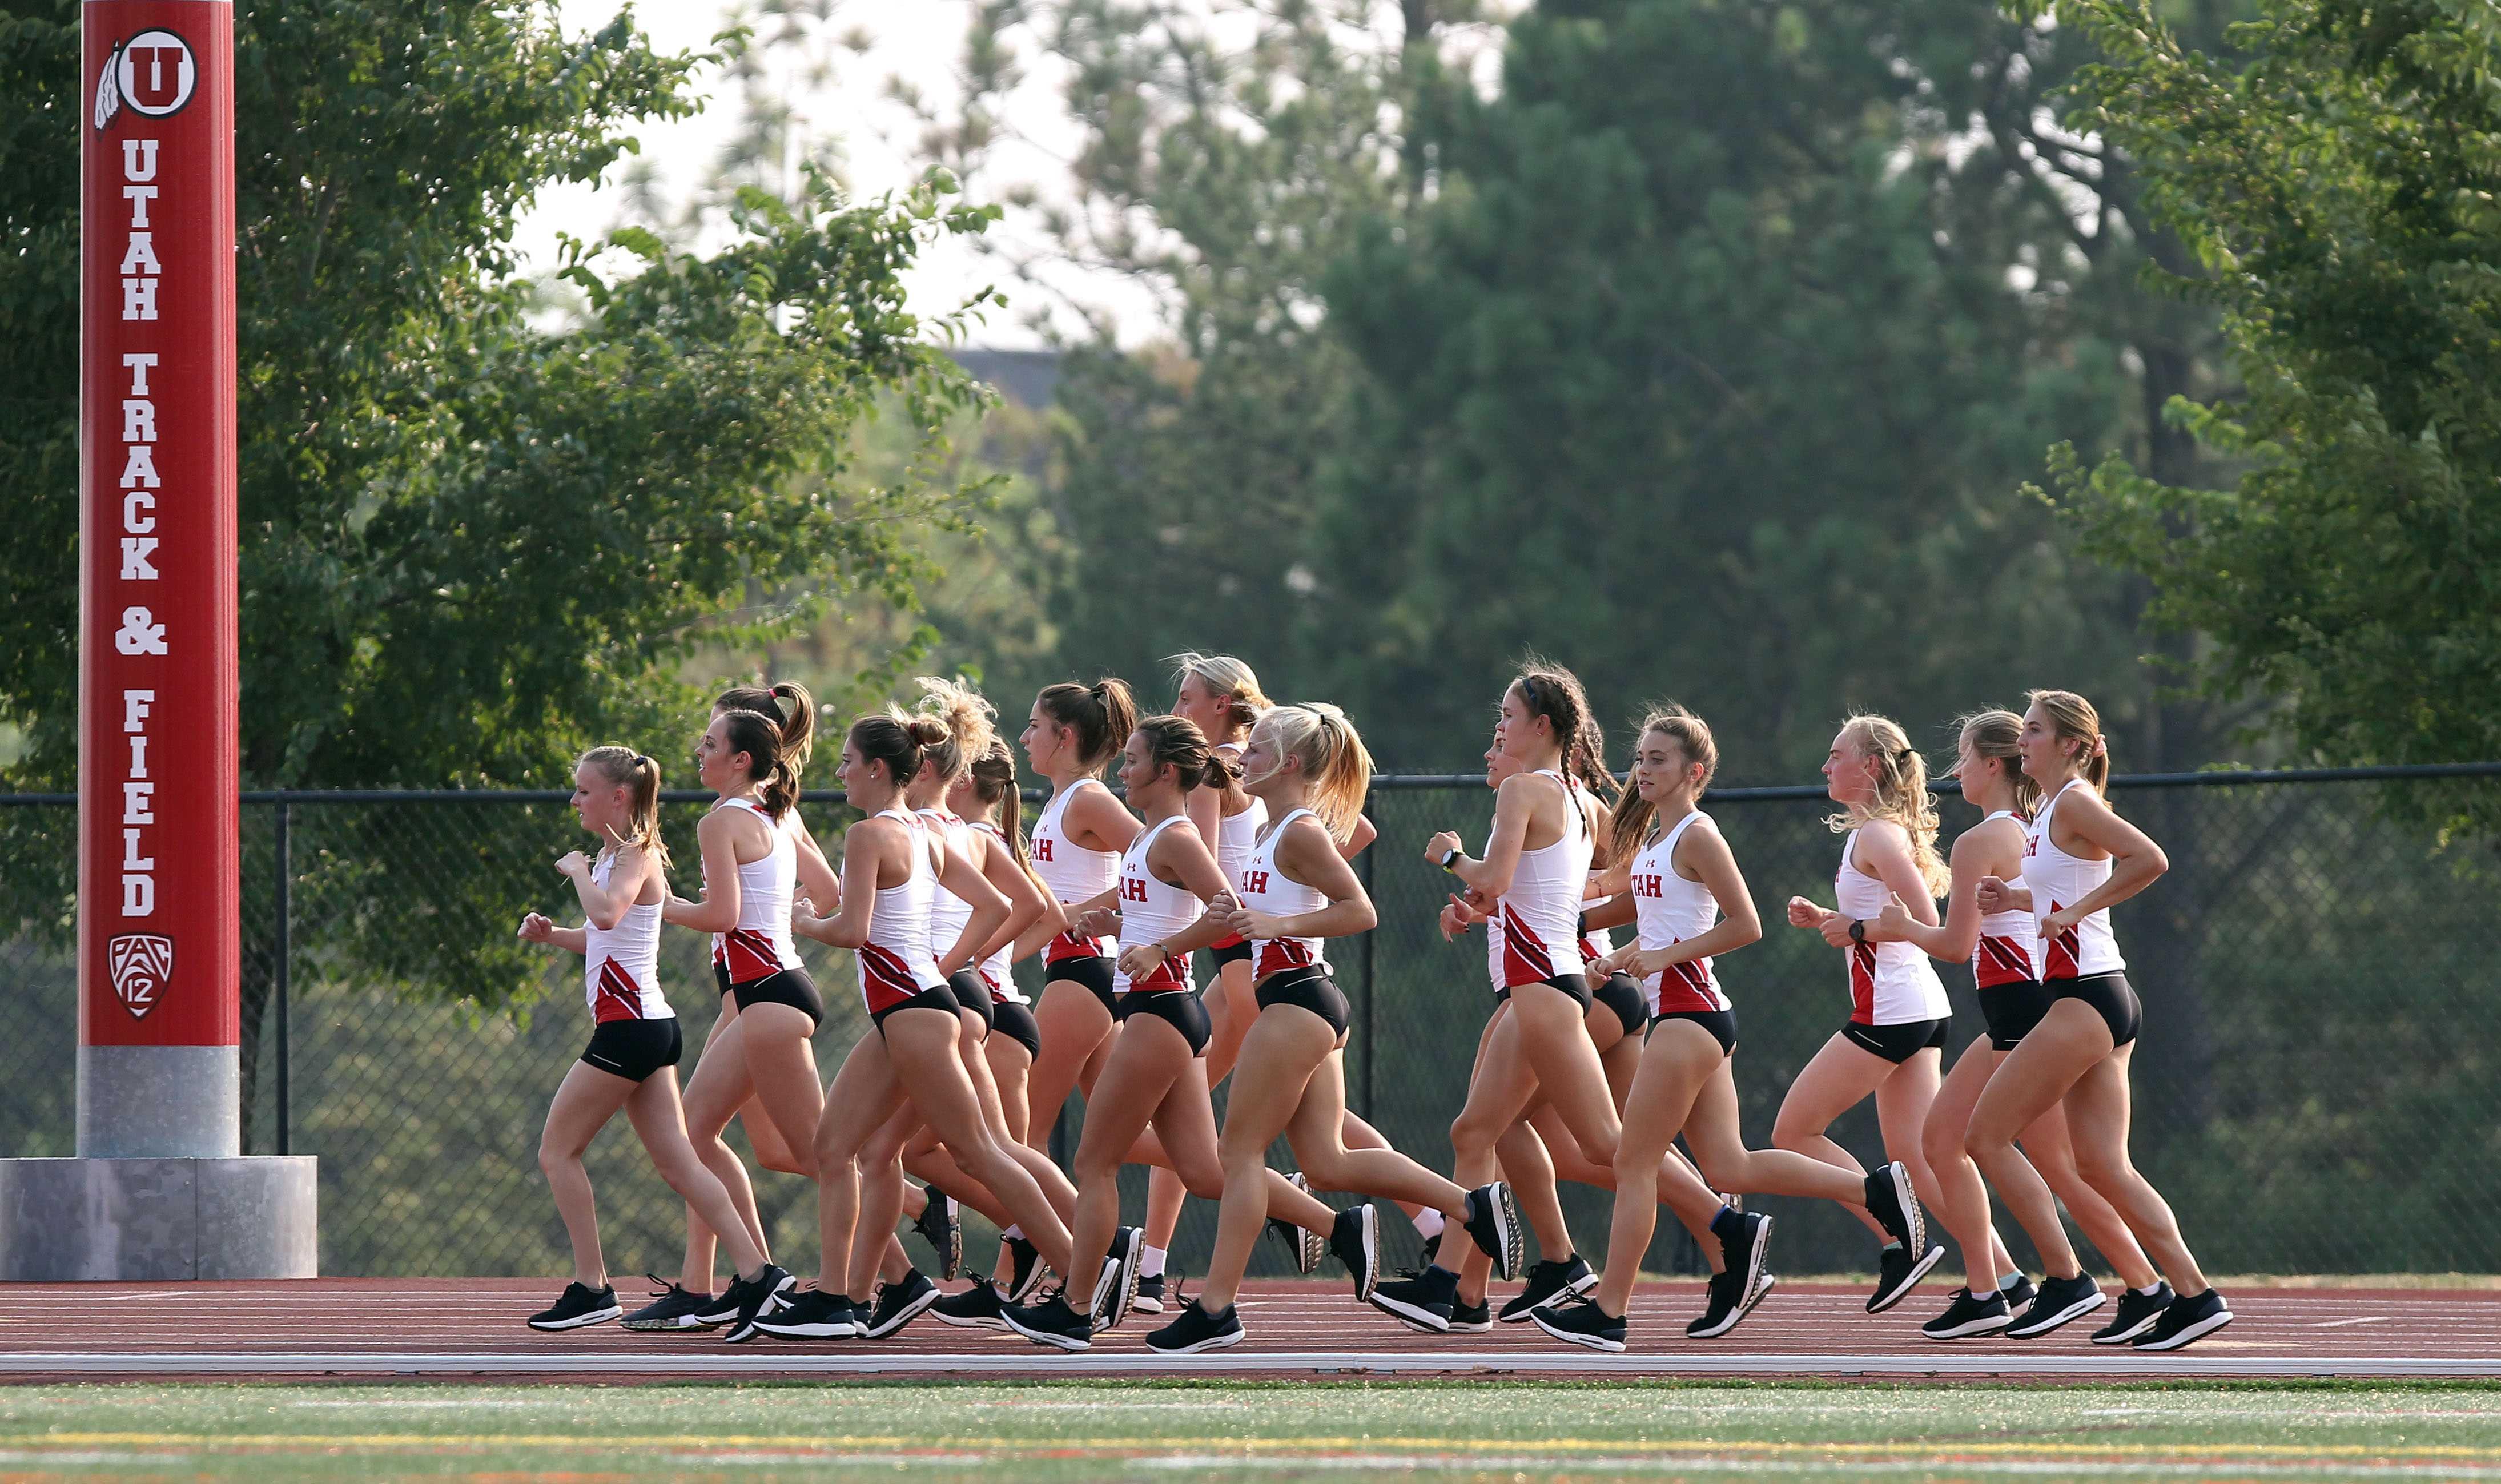 Team, Utah Cross Country / Track and Field August 21, 2018 in Salt Lake City, UT. (Photo / Steve C. Wilson / University of Utah)